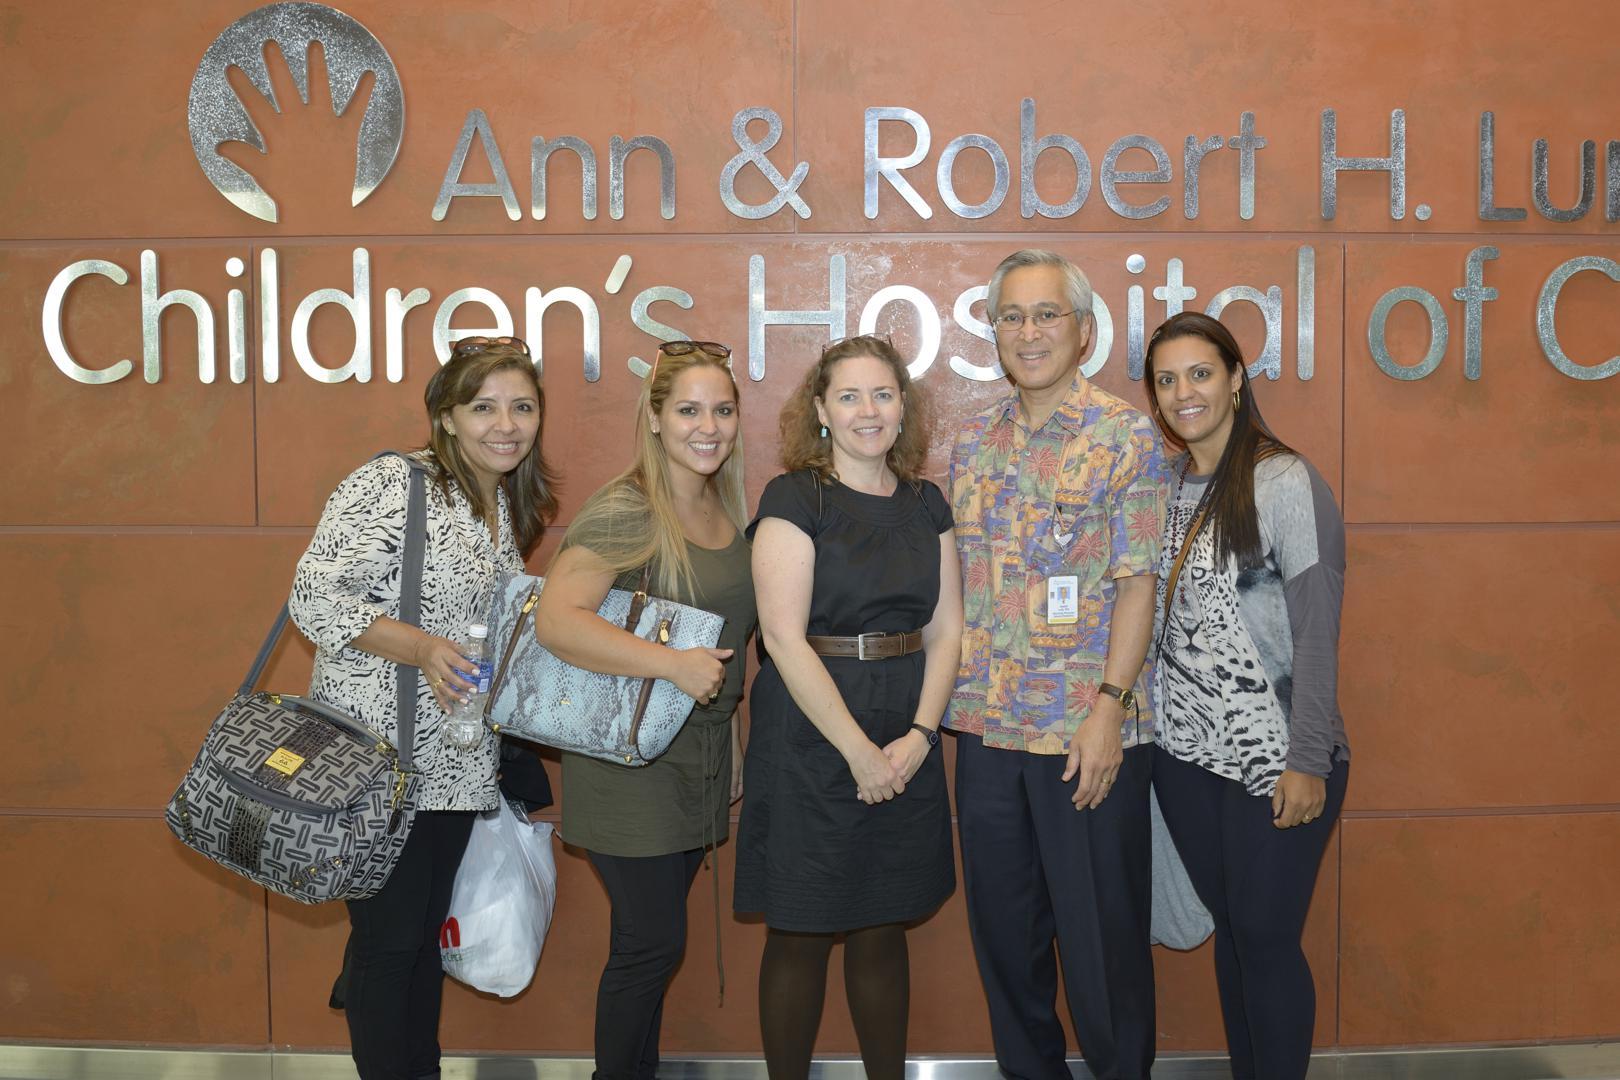 Dr. Alejandra Uriona, Director of Hospital de Ninos, and her colleagues, toured Lurie Children's Hospital alongside Solidarity Bridge's Dr. Dan Lum and Jodi Grahl.